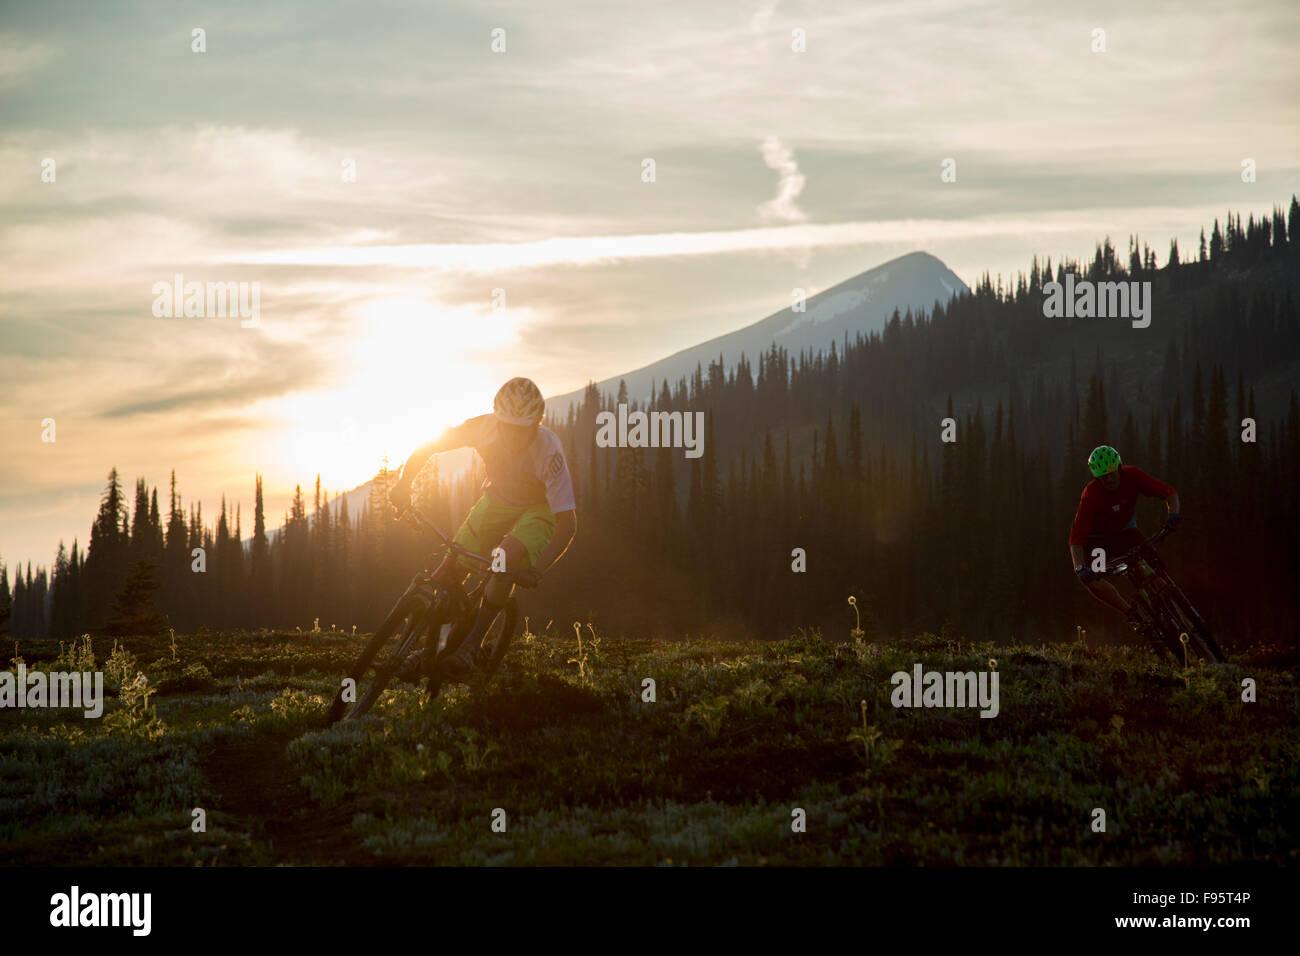 Randonnée cycliste, Singletrack, Mont Fostall, montagnes Monashee, Sol Mountain Lodge, Colombie Britannique, Photo Stock